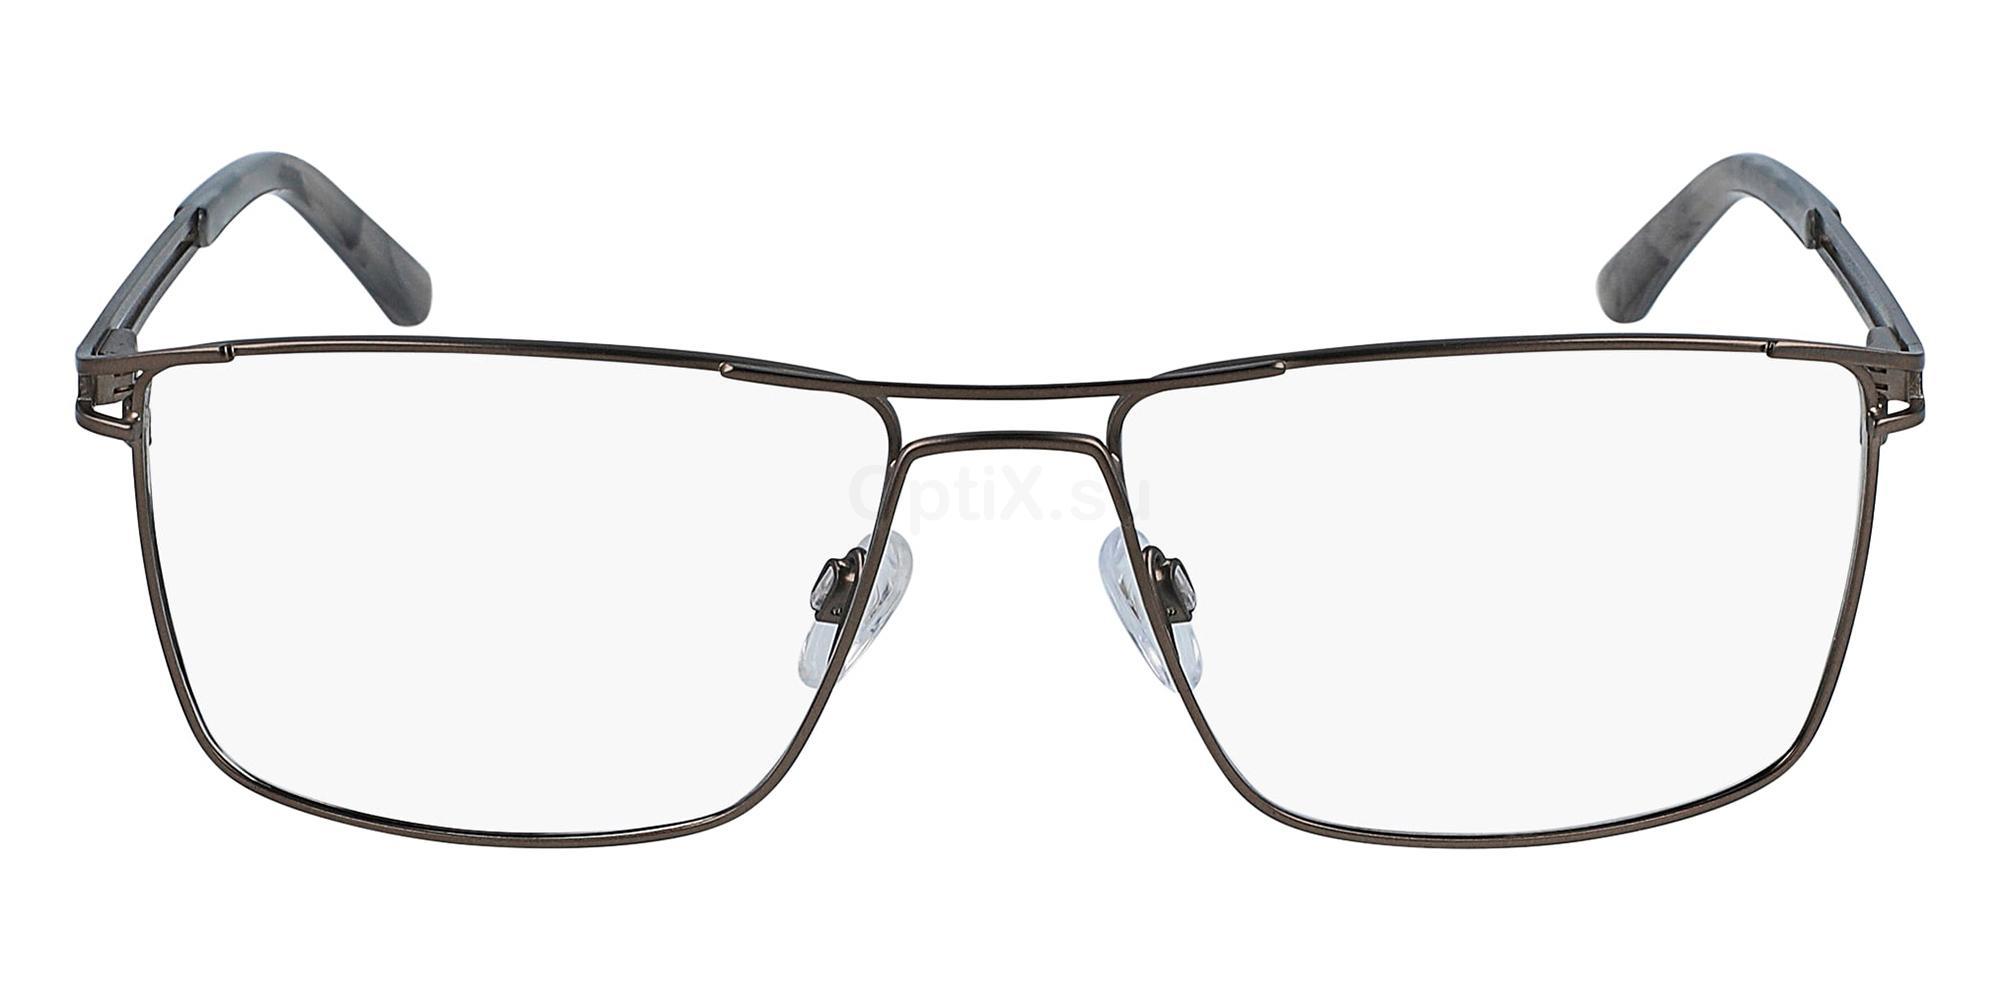 035 SK2834 VISION Glasses, Skaga